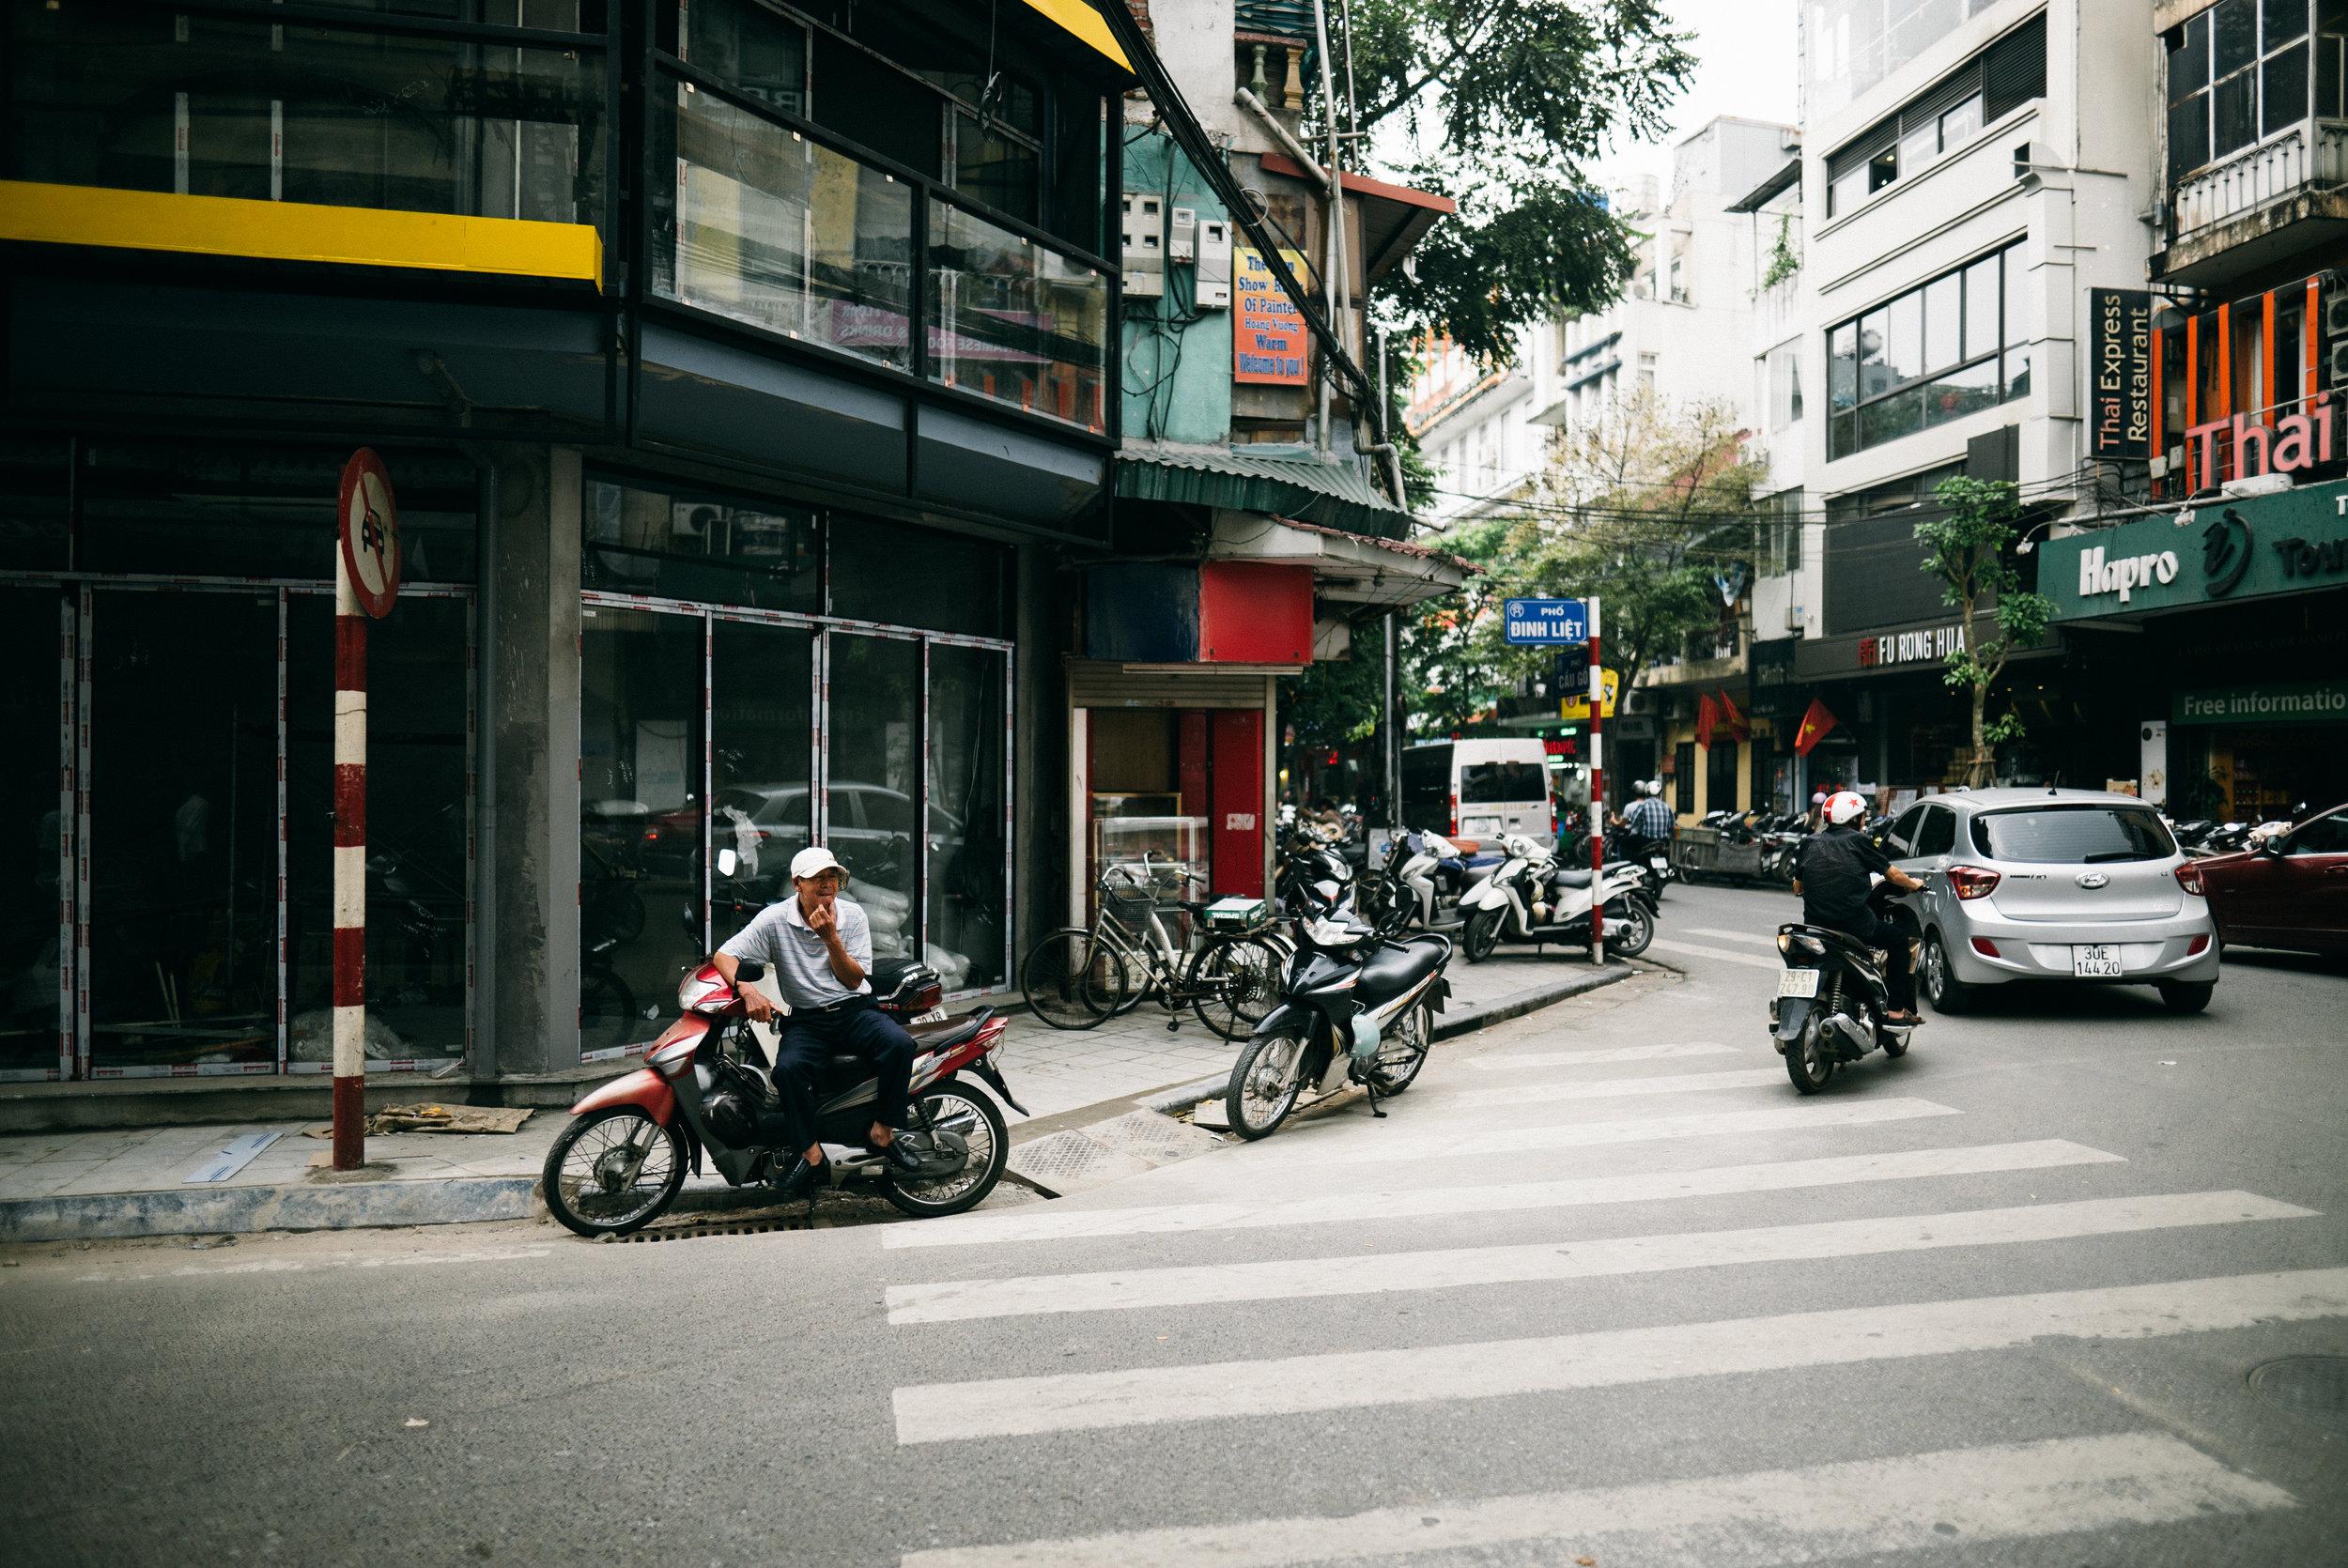 20170426_Vietnam_00002.jpg